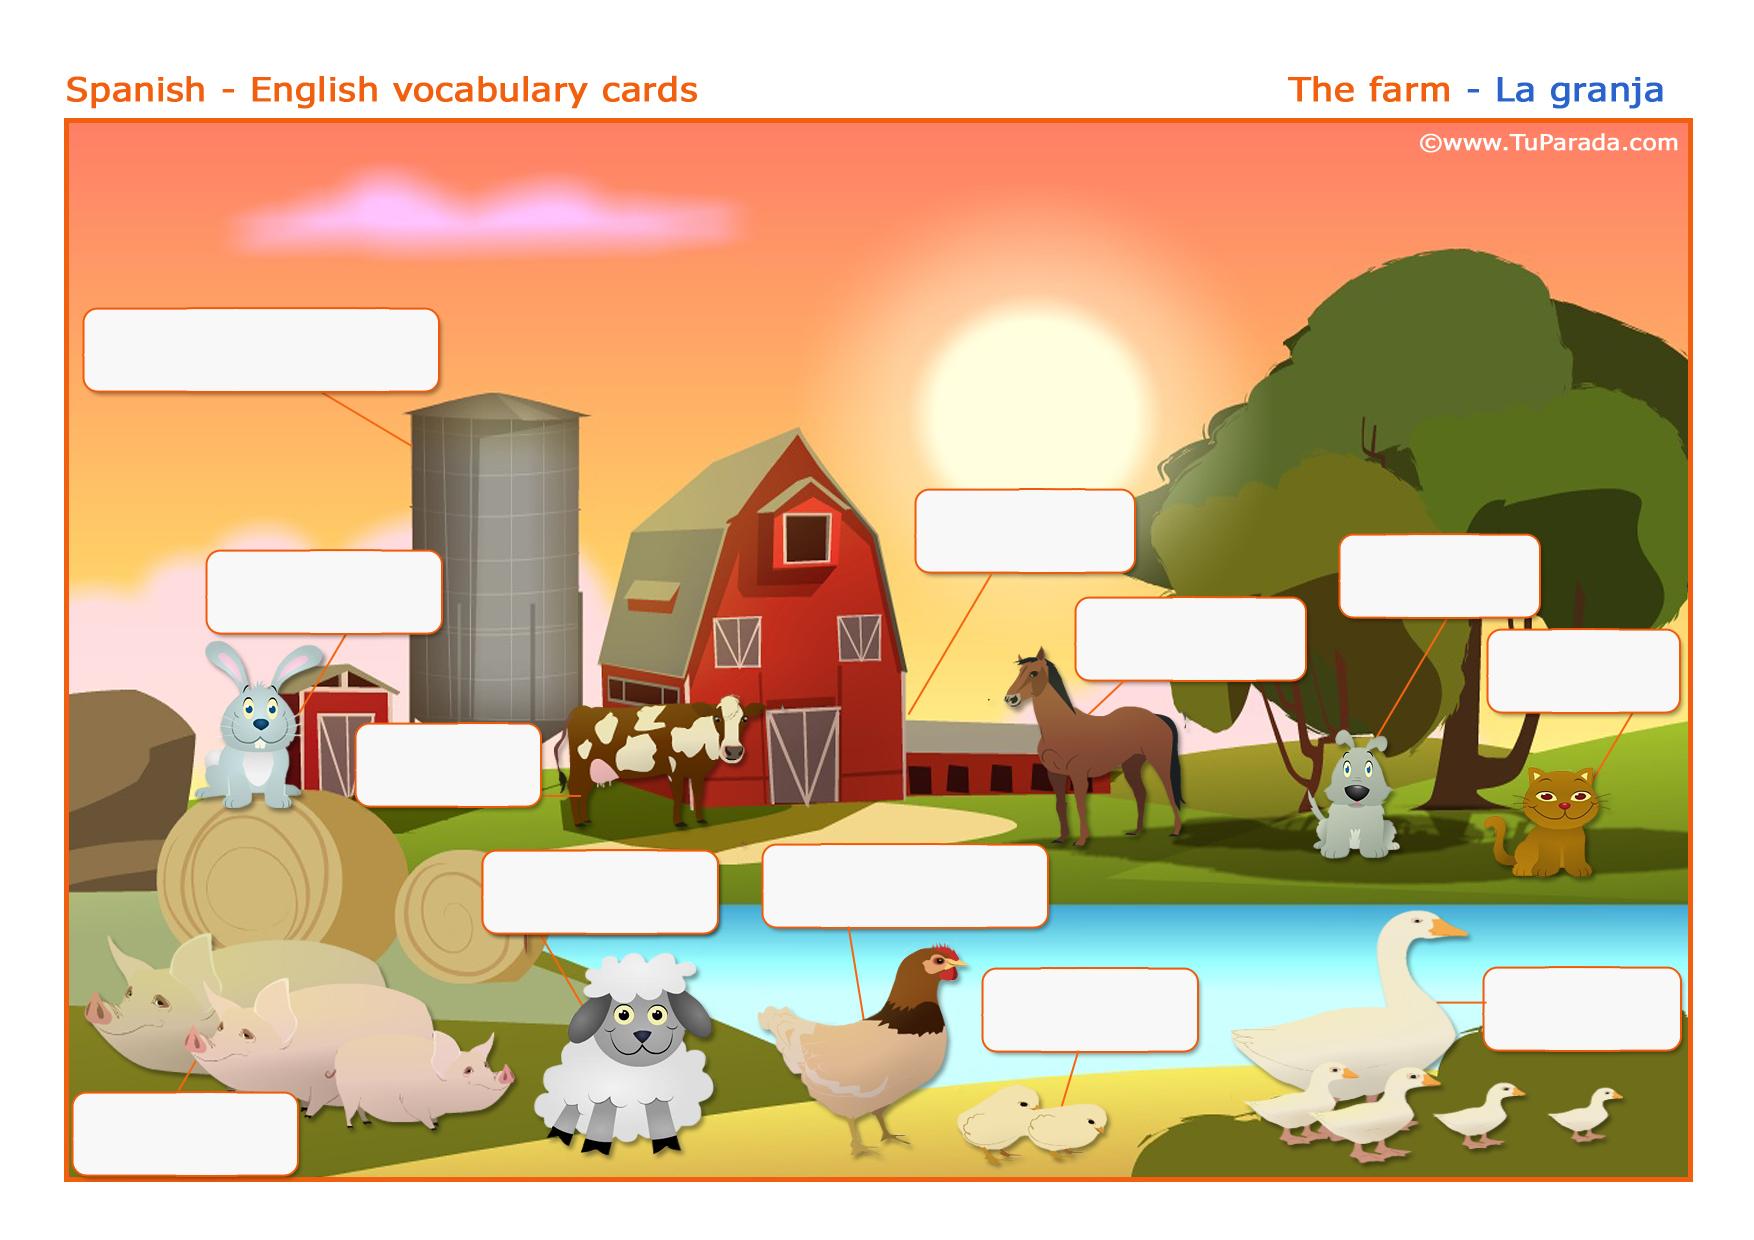 Tarjeta - Vocabulario: Granja - Farm. Imprimir.